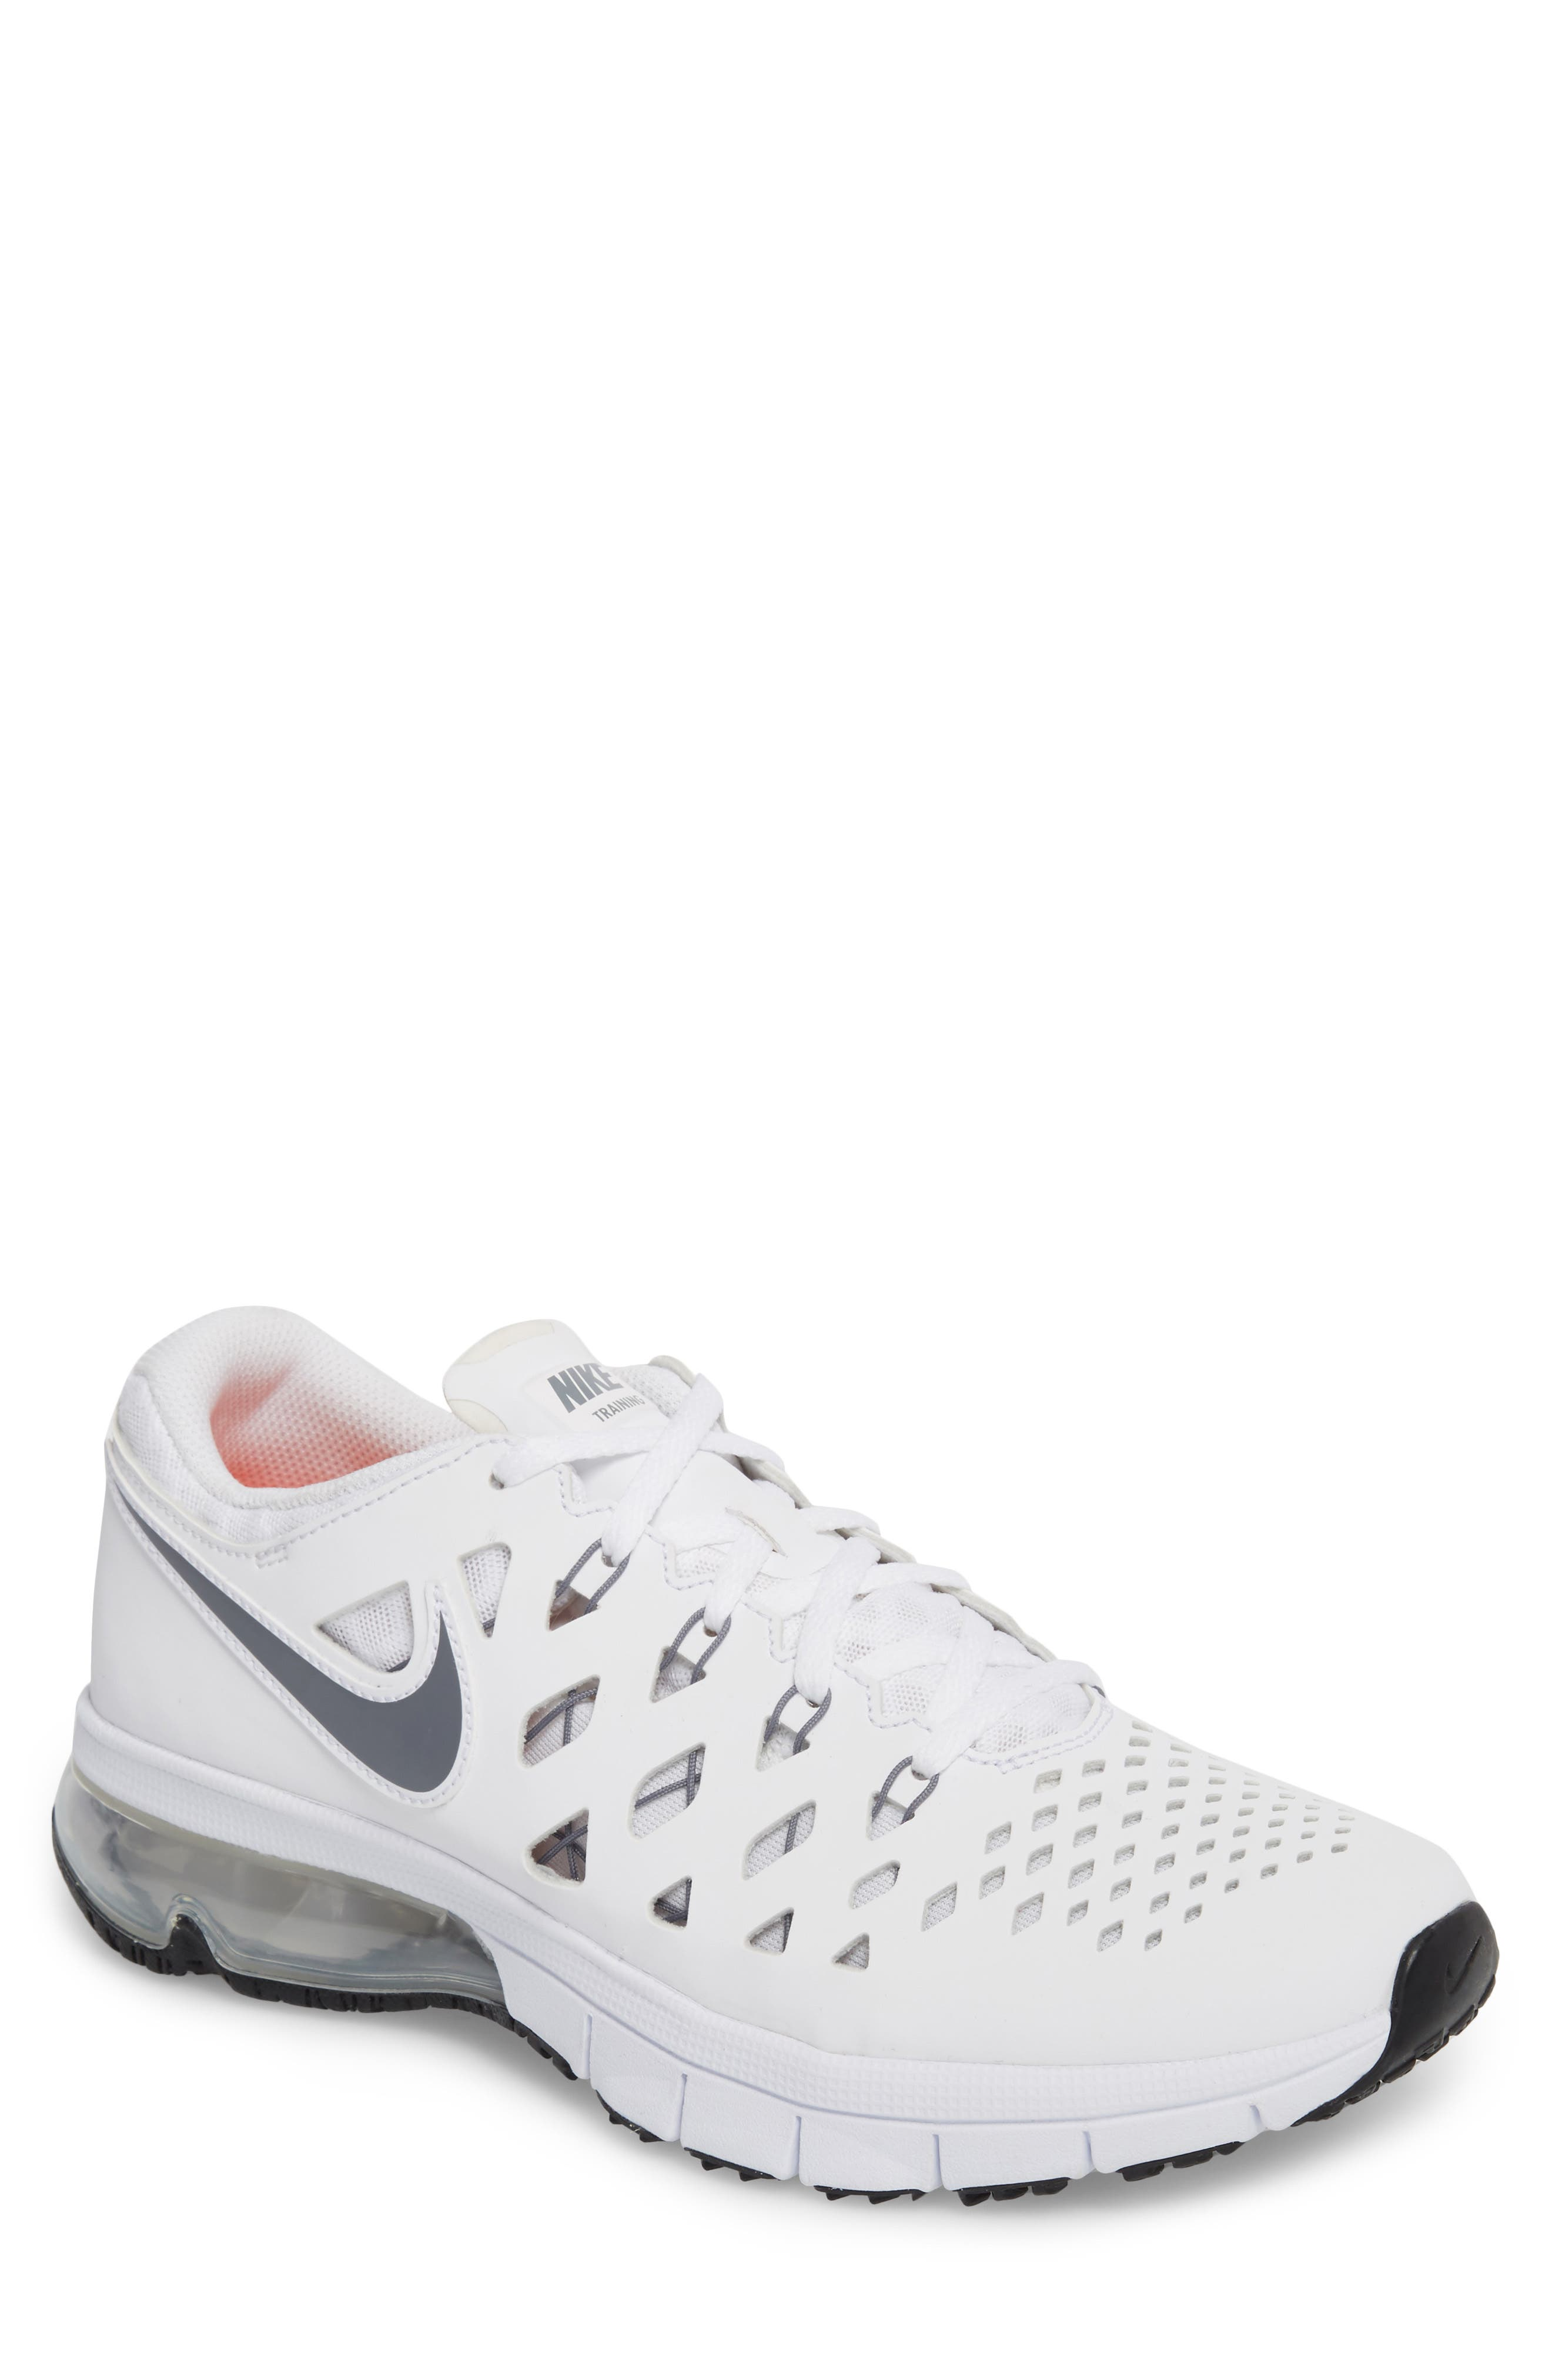 Air Trainer 180 Training Shoe,                             Main thumbnail 1, color,                             White/ Cool Grey-Black